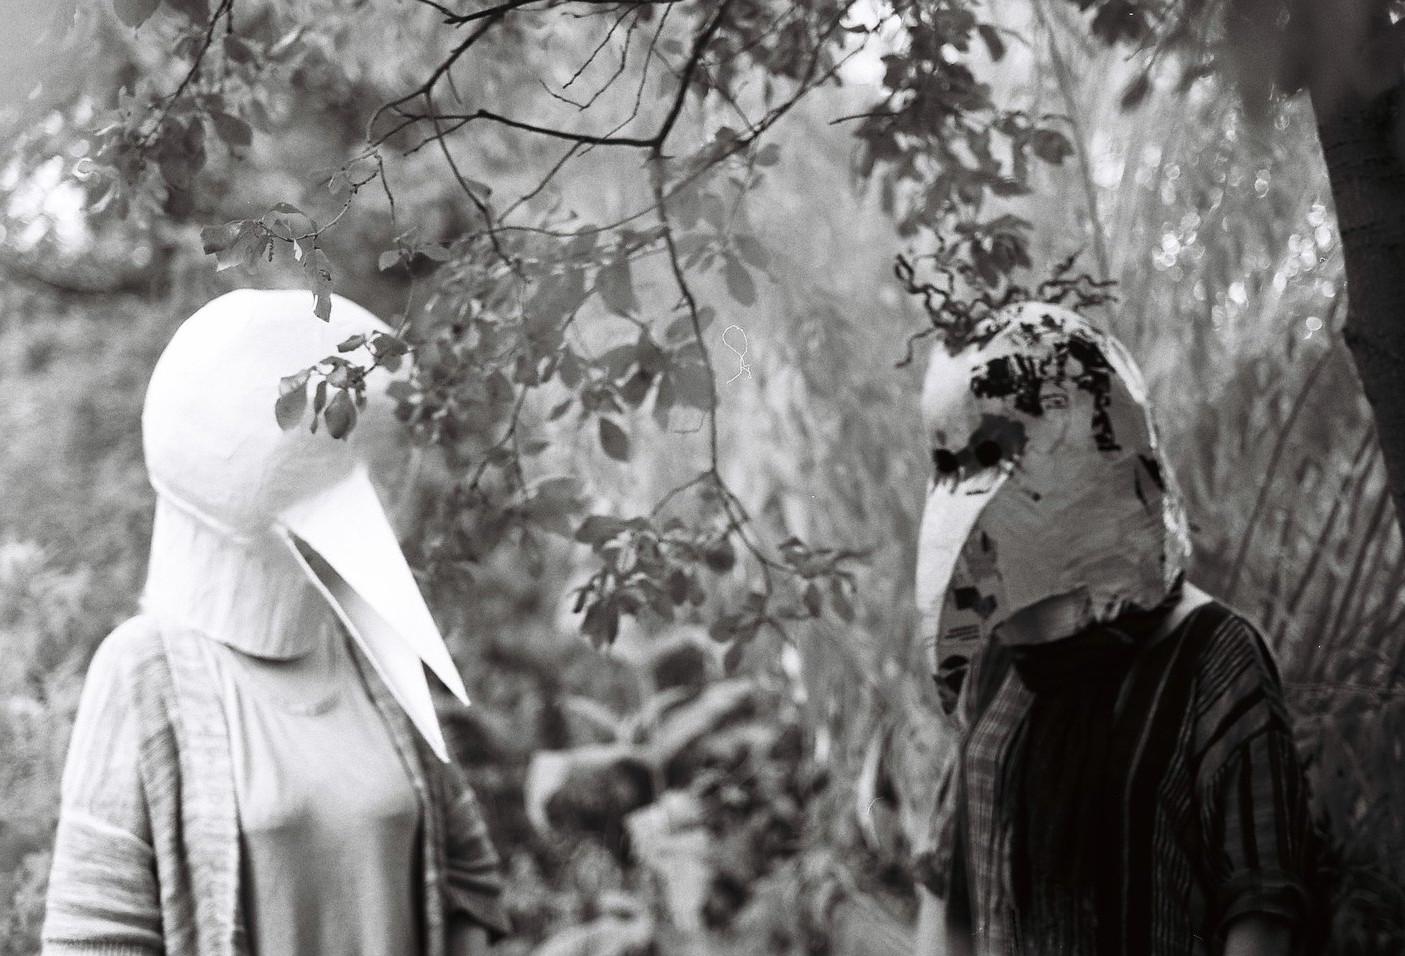 Secret meeting, Birdman Series, 2019